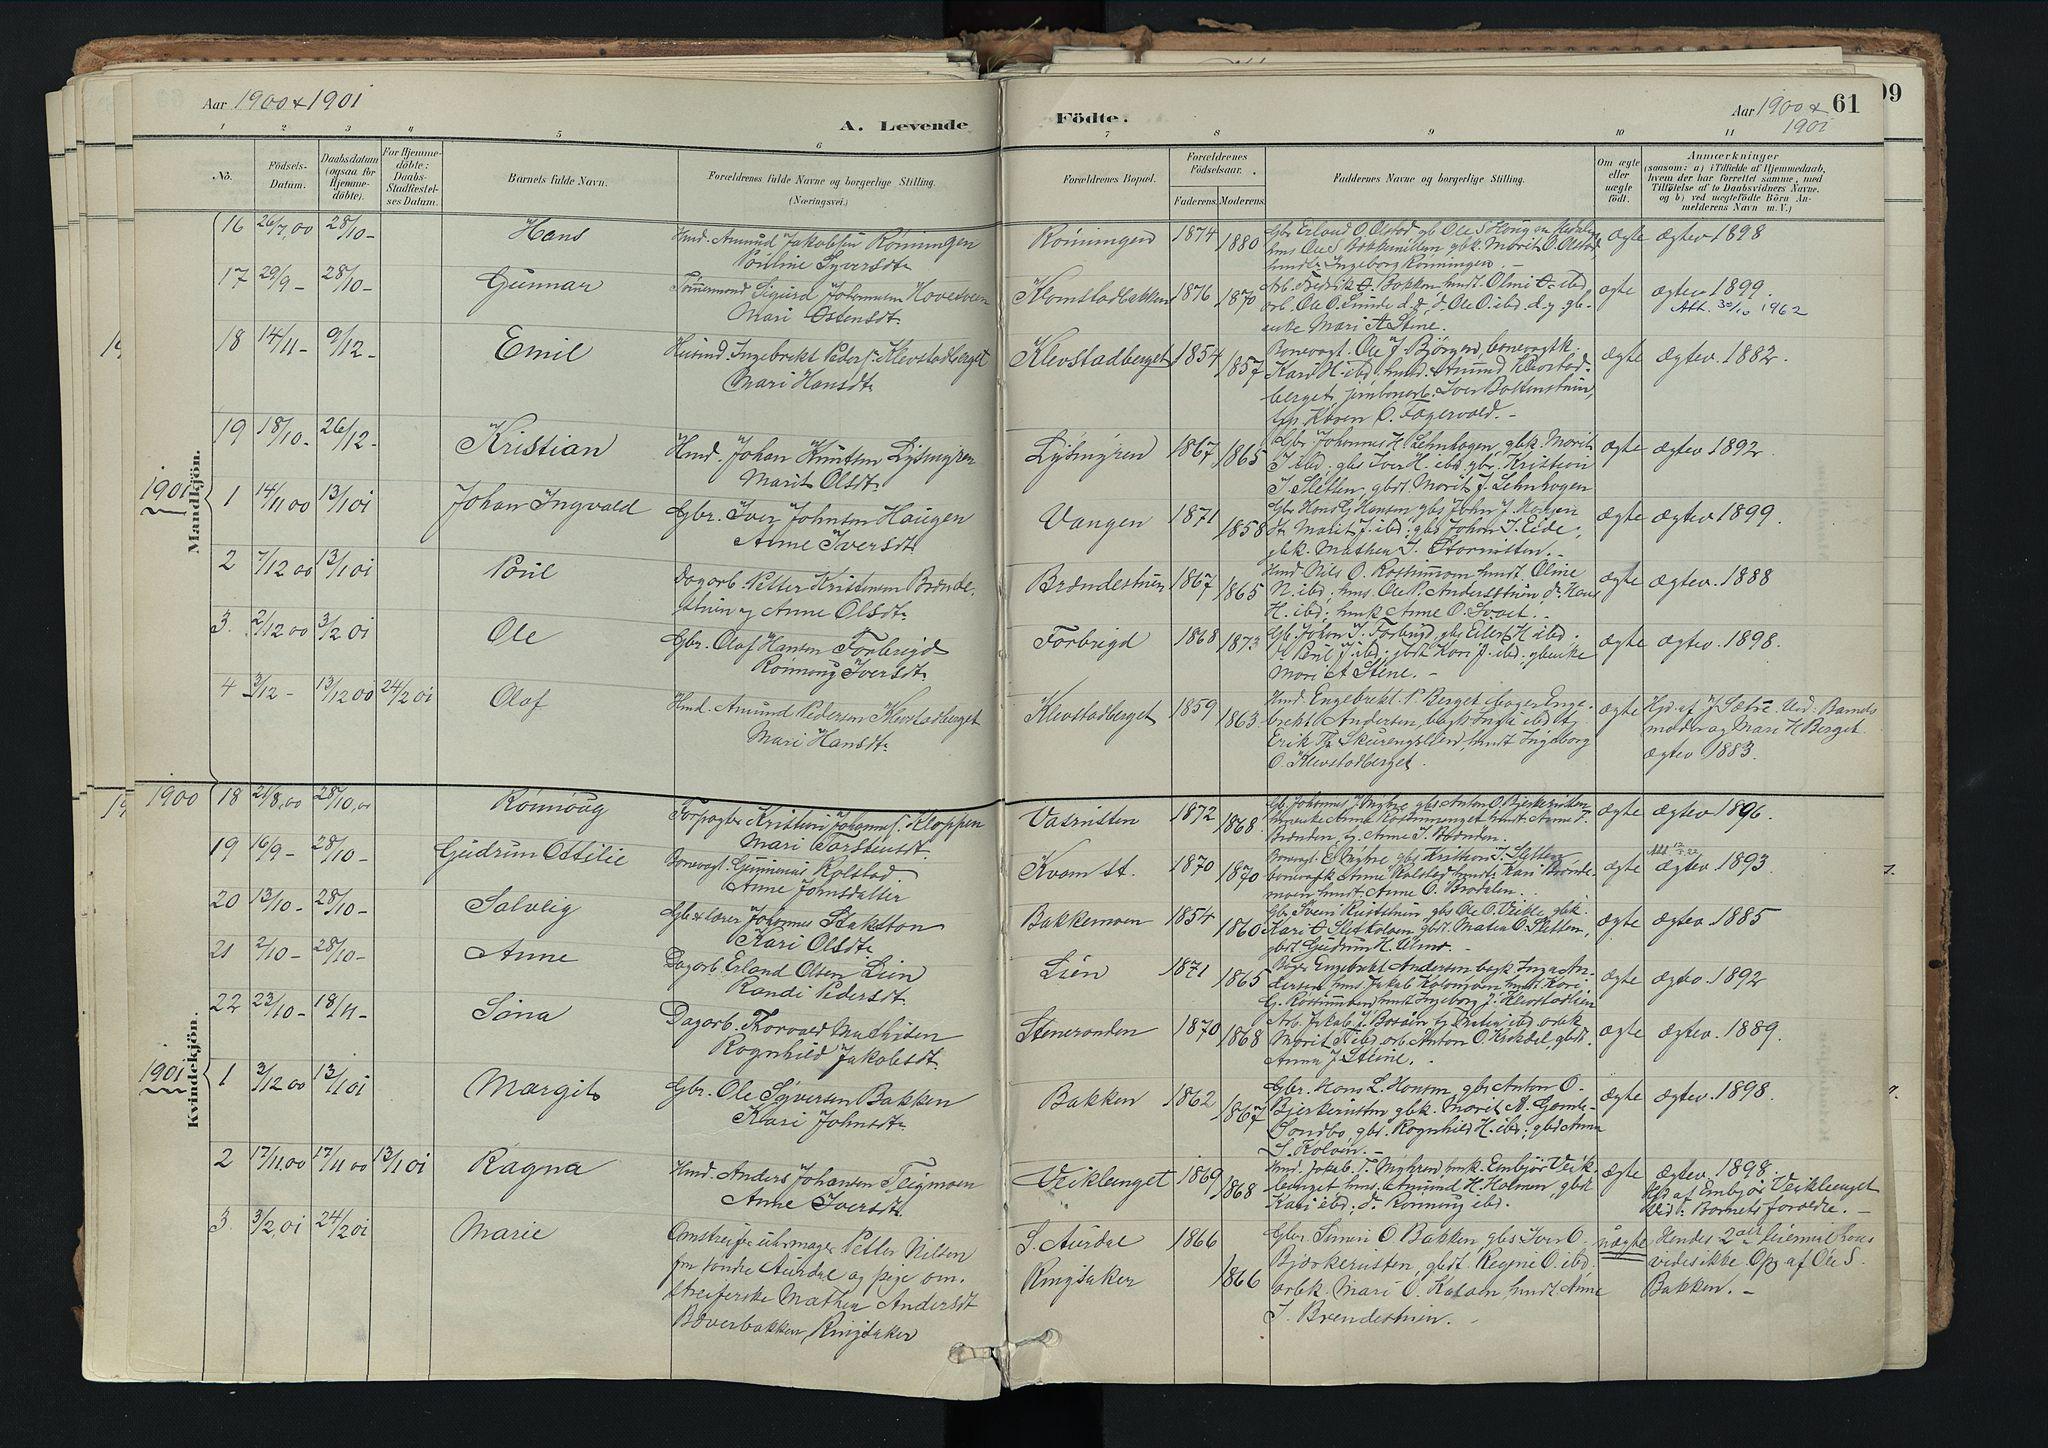 SAH, Nord-Fron prestekontor, Ministerialbok nr. 3, 1884-1914, s. 61